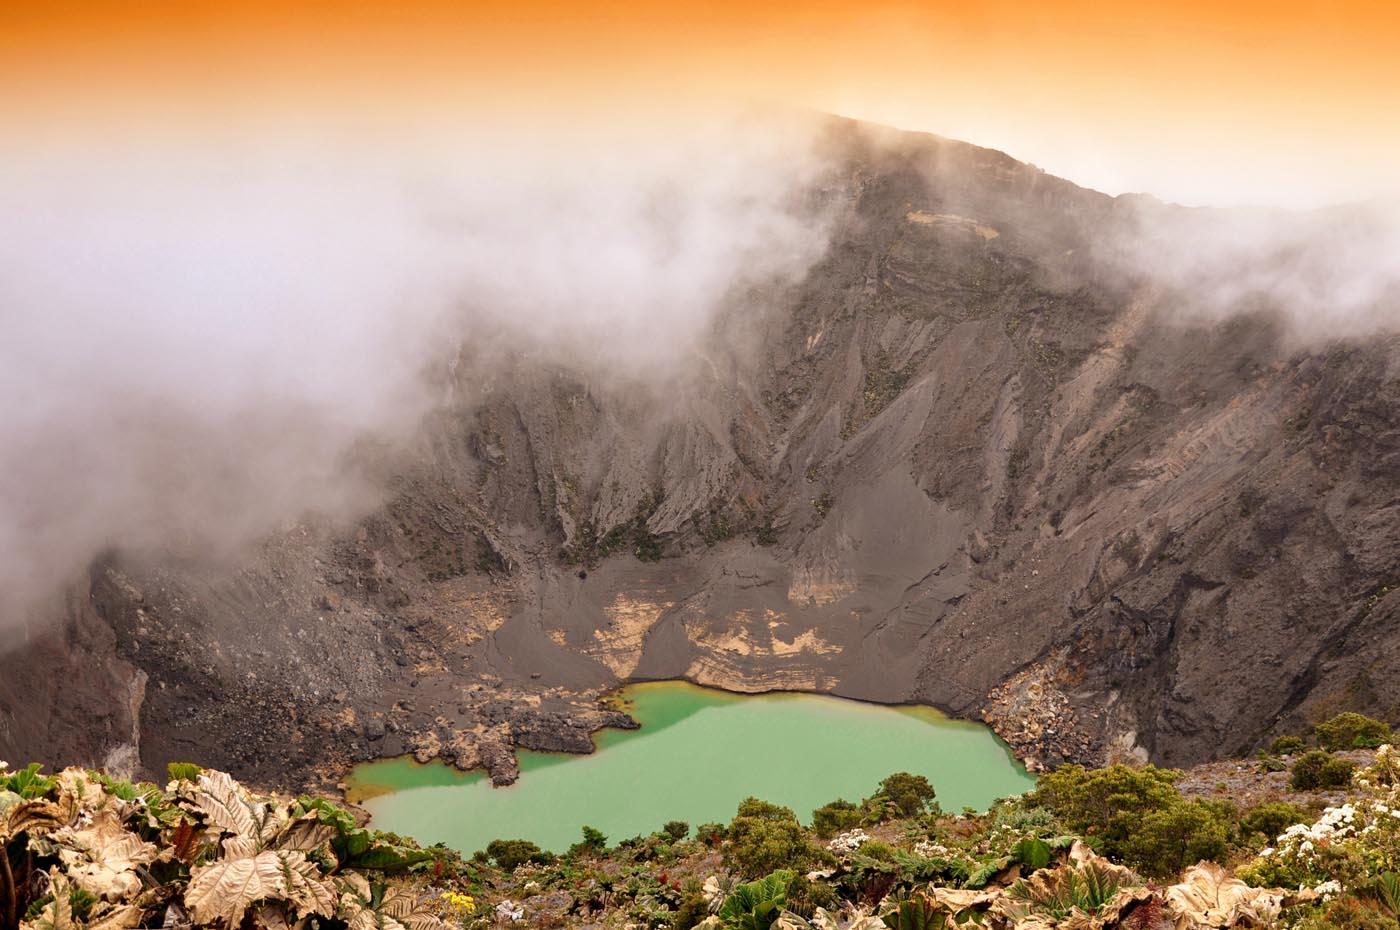 Die 10 besten Spots in Costa Rica - Photo+Adventure